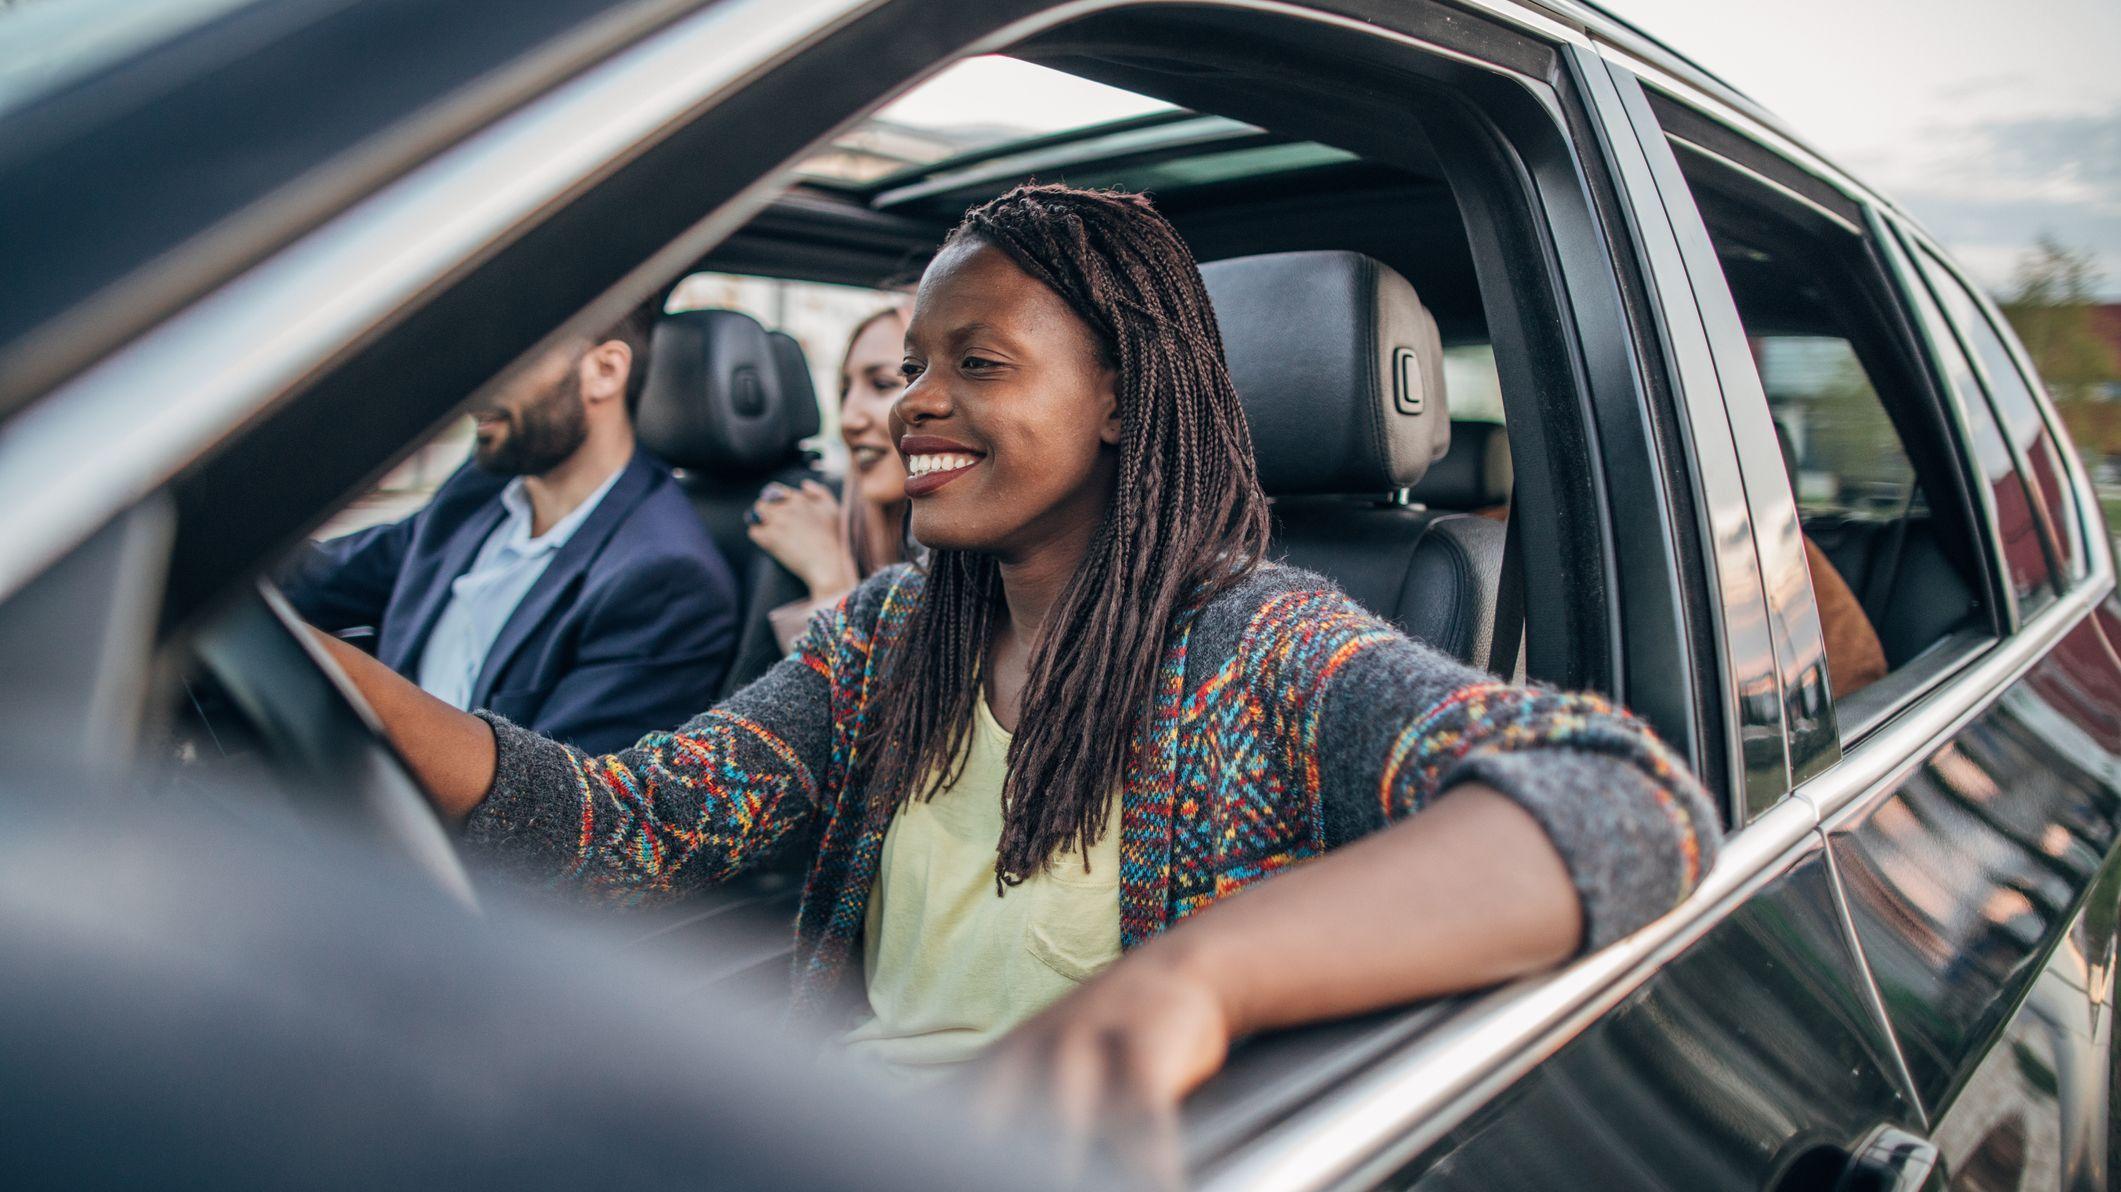 9 Secrets of Uber Drivers Uber driver, Uber driving, Uber